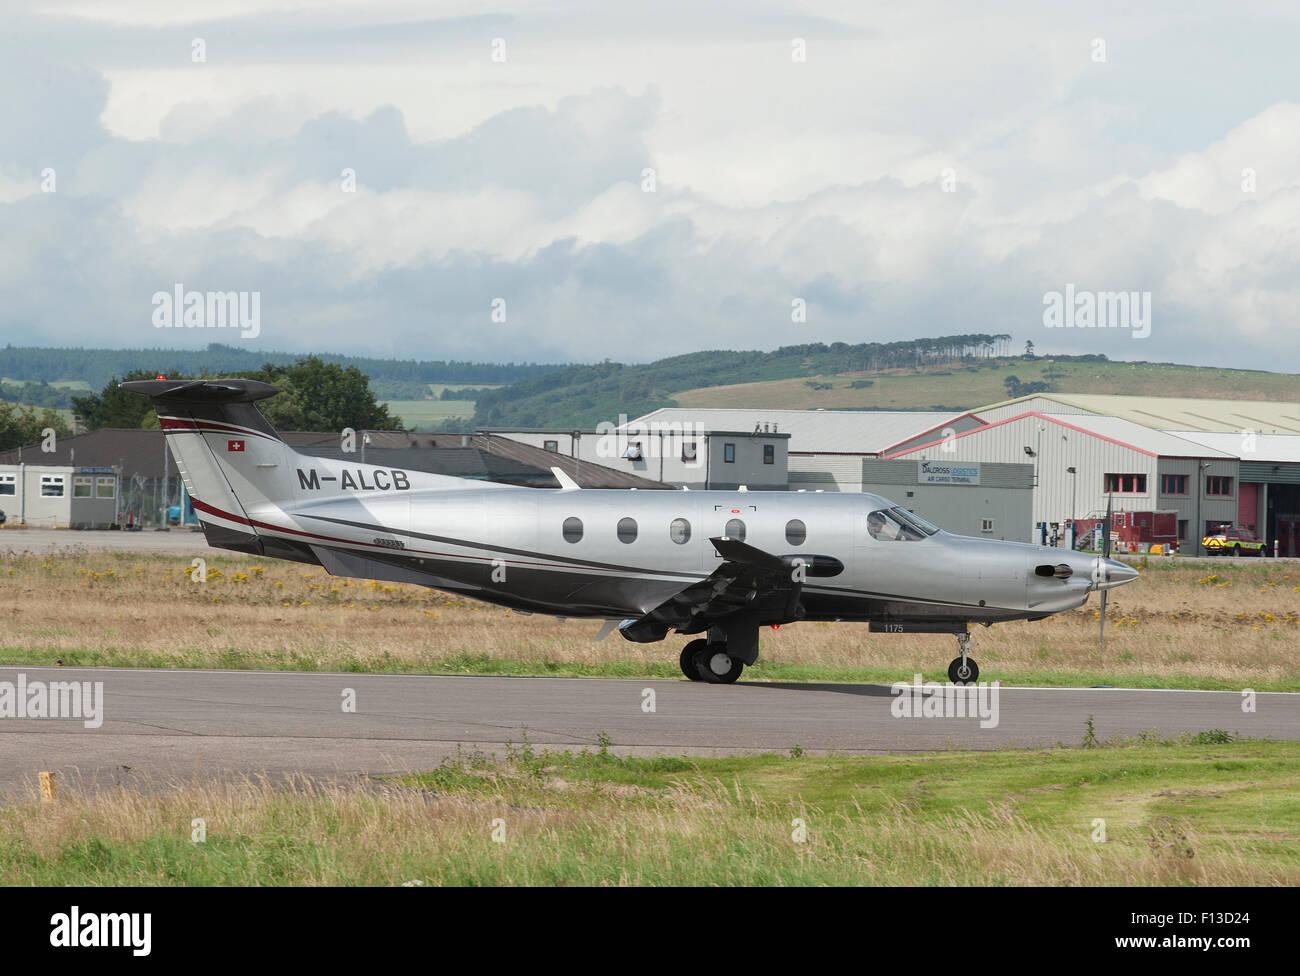 Pilatus PC-12NG (PC-12/47E) Maltese registered (M-ALCB) at Inverness, Scotland.  SCO 10,052. - Stock Image